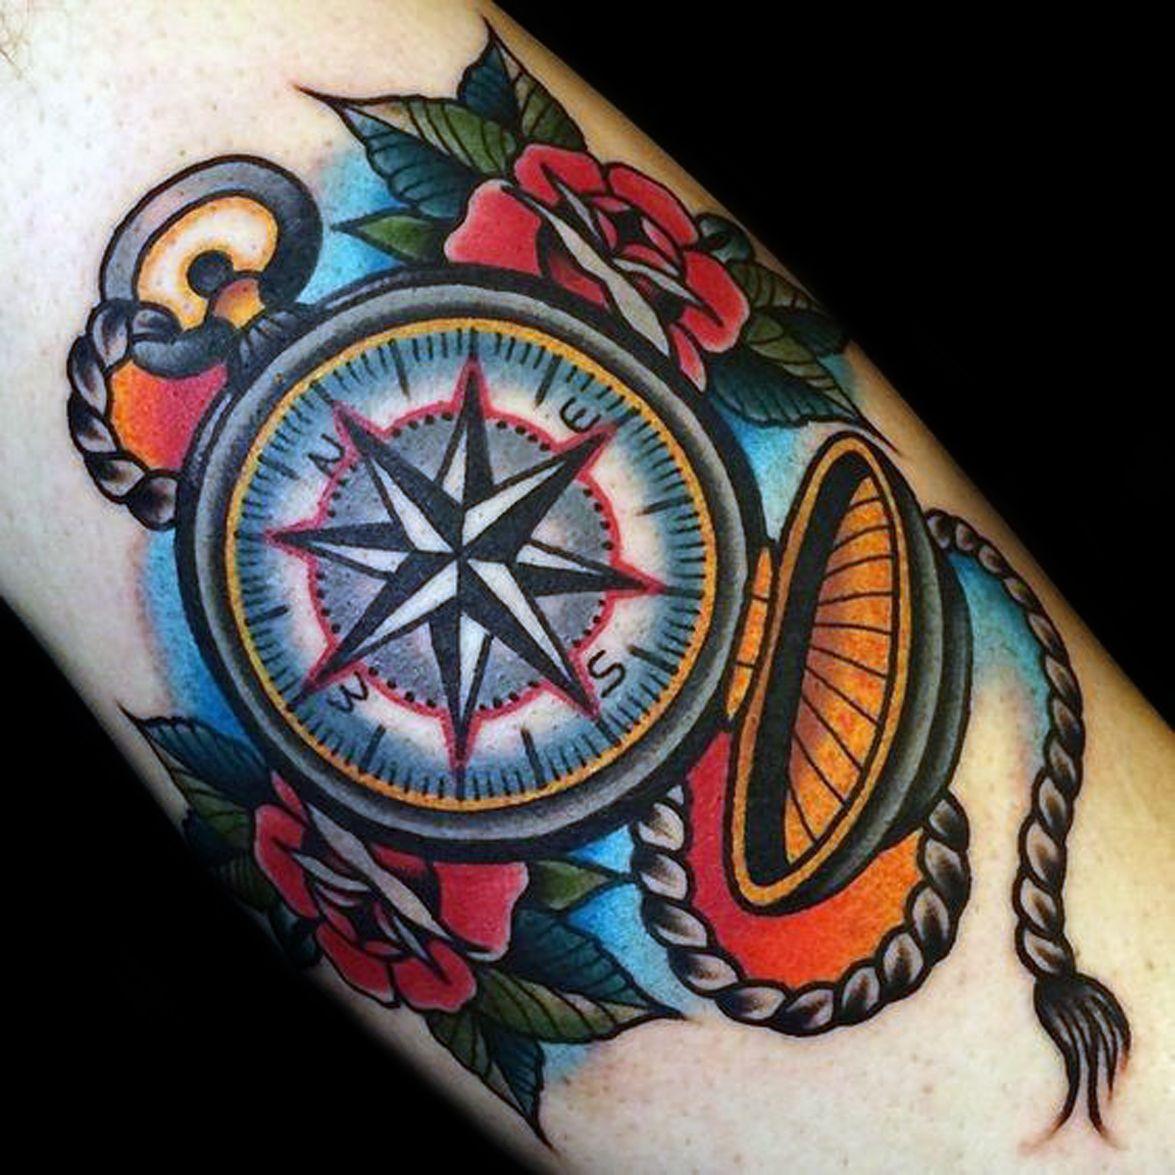 Tattoo Brujula Traditional Compass Tattoo Tattoos For Guys